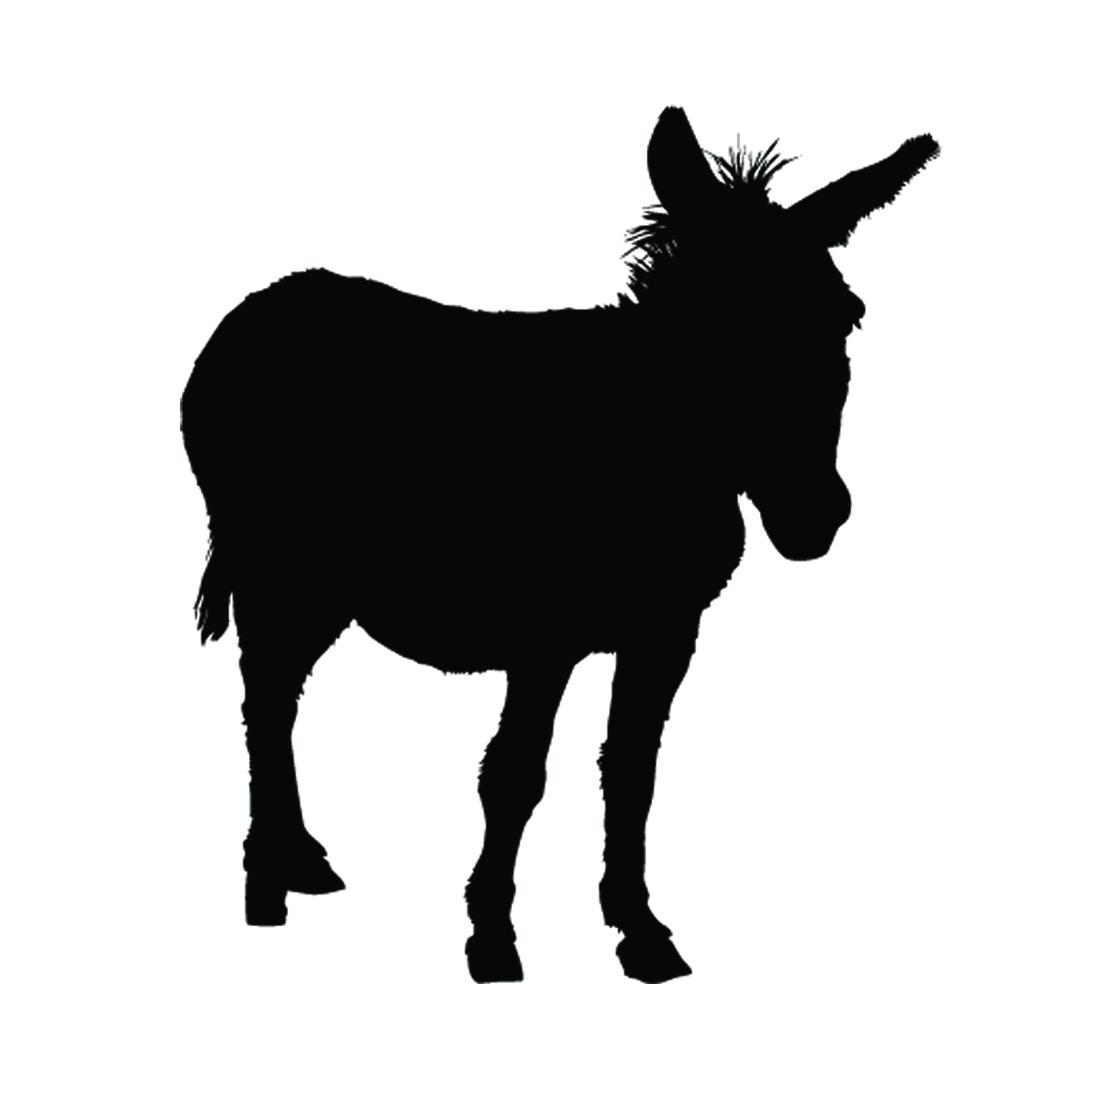 1100x1100 Donkey Silhouette Stencil Free Stencil Gallery